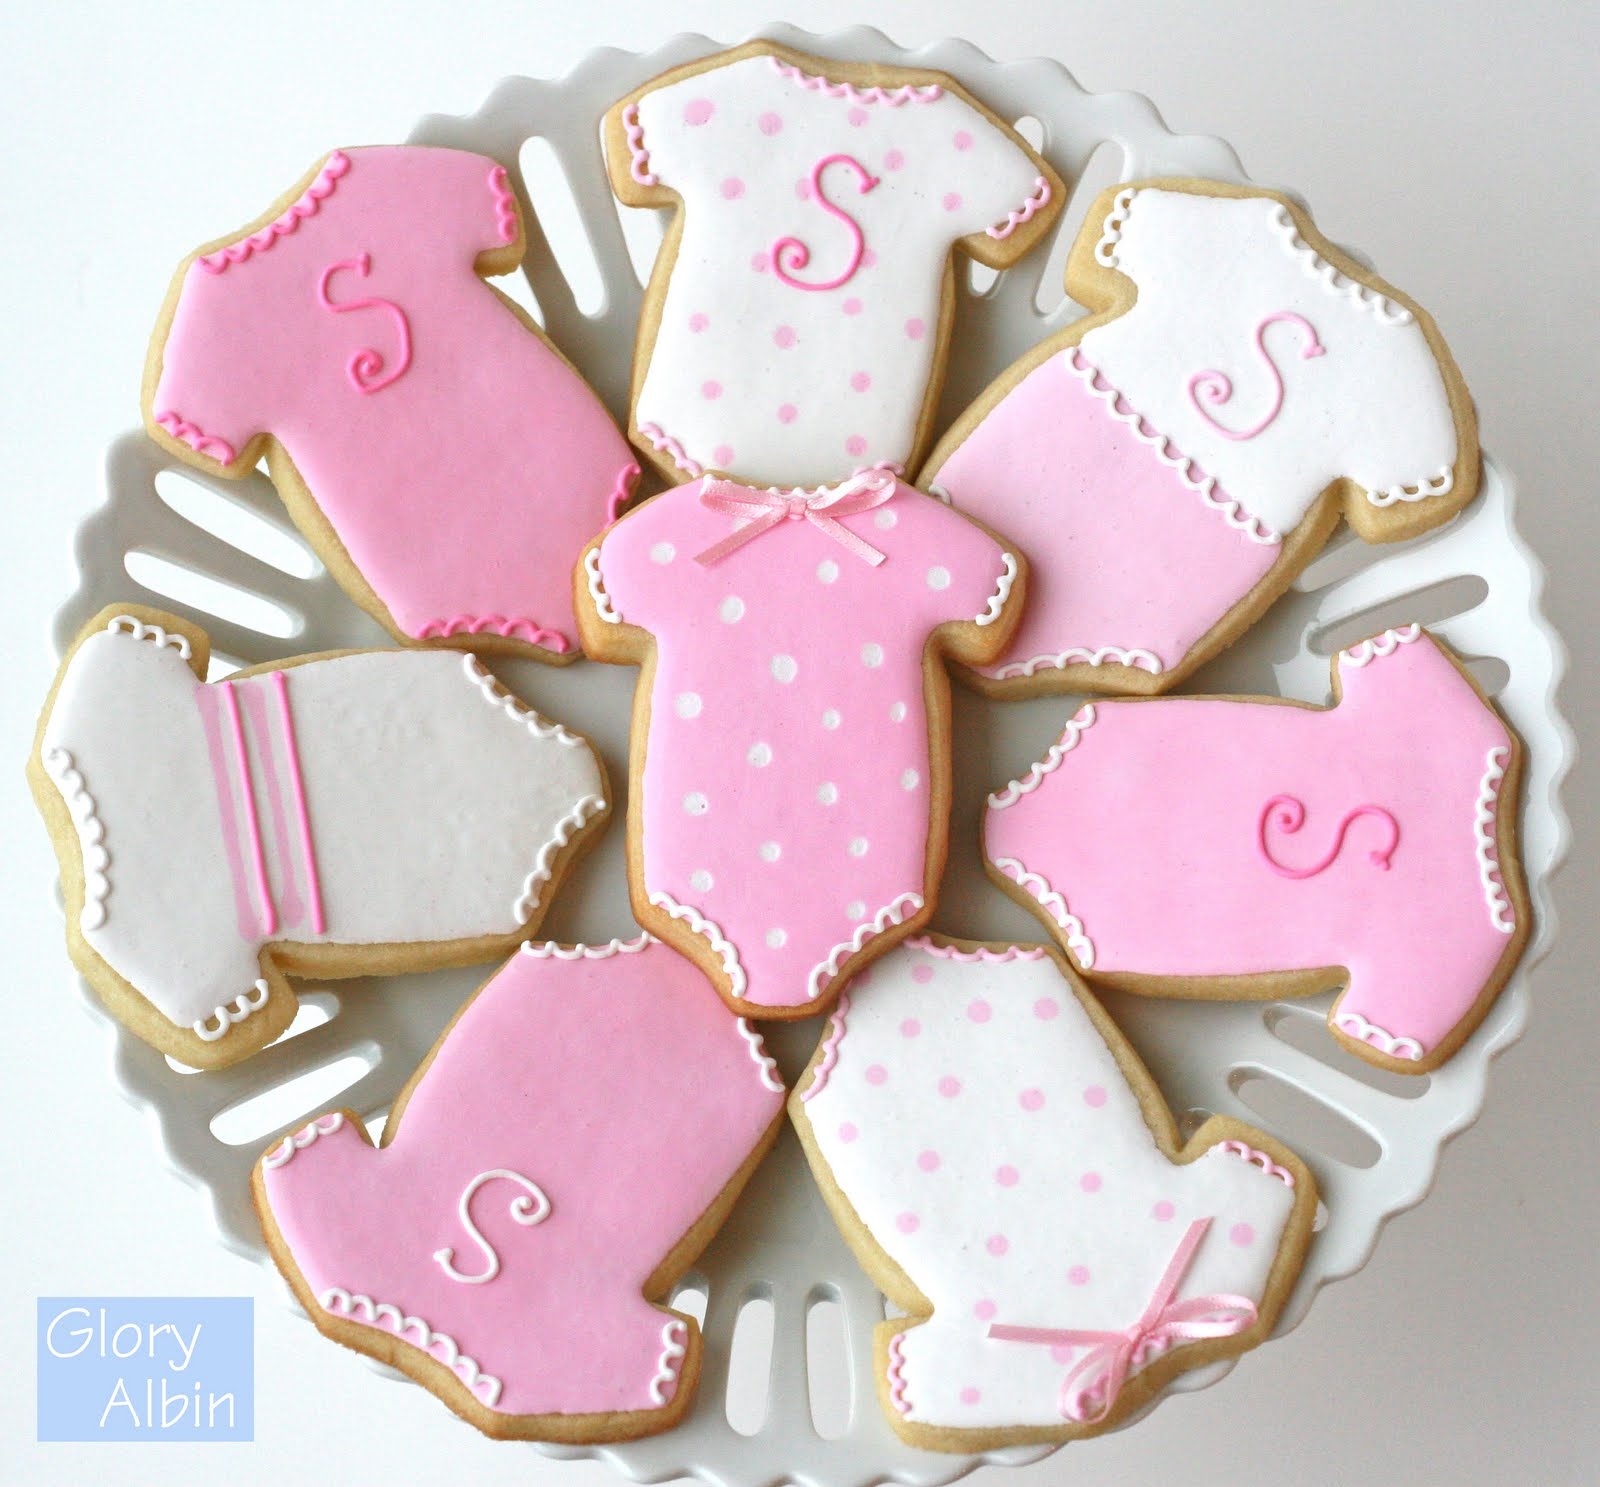 Decorating Sugar Cookies with Royal Icing  Glorious Treats